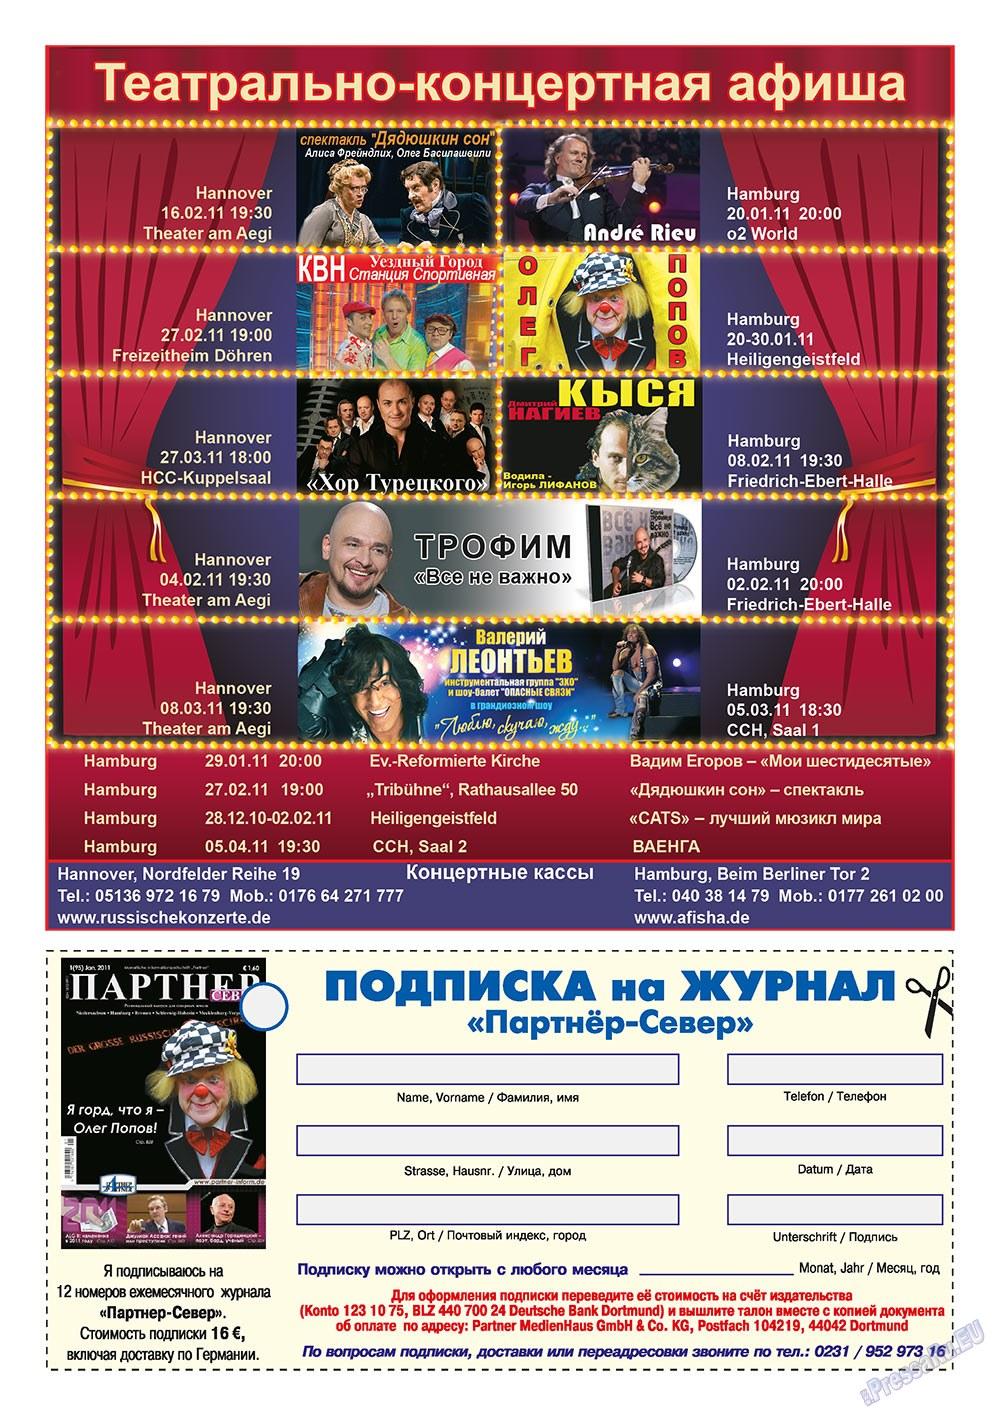 Партнер-север (журнал). 2011 год, номер 1, стр. 65